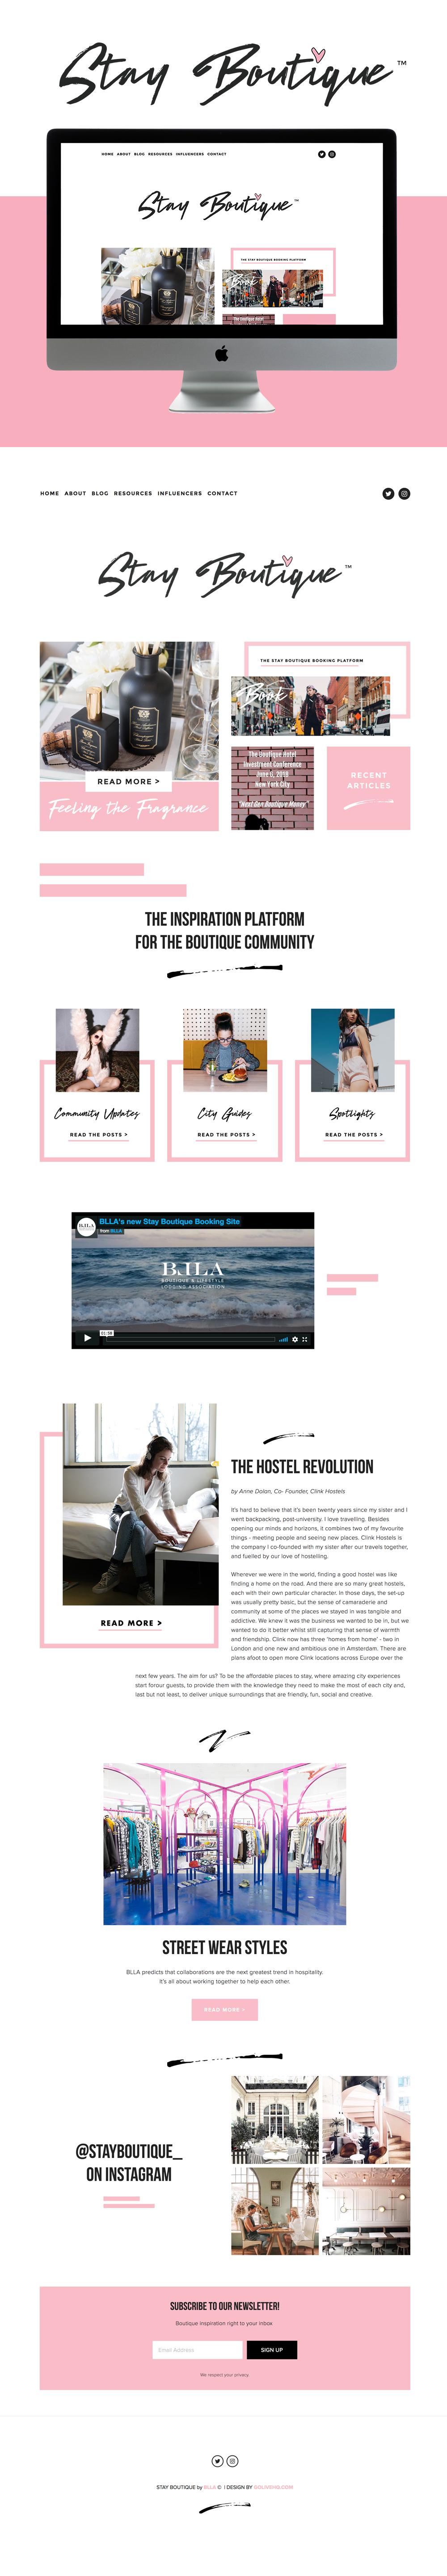 Boutique website inspiration | Go live Hq